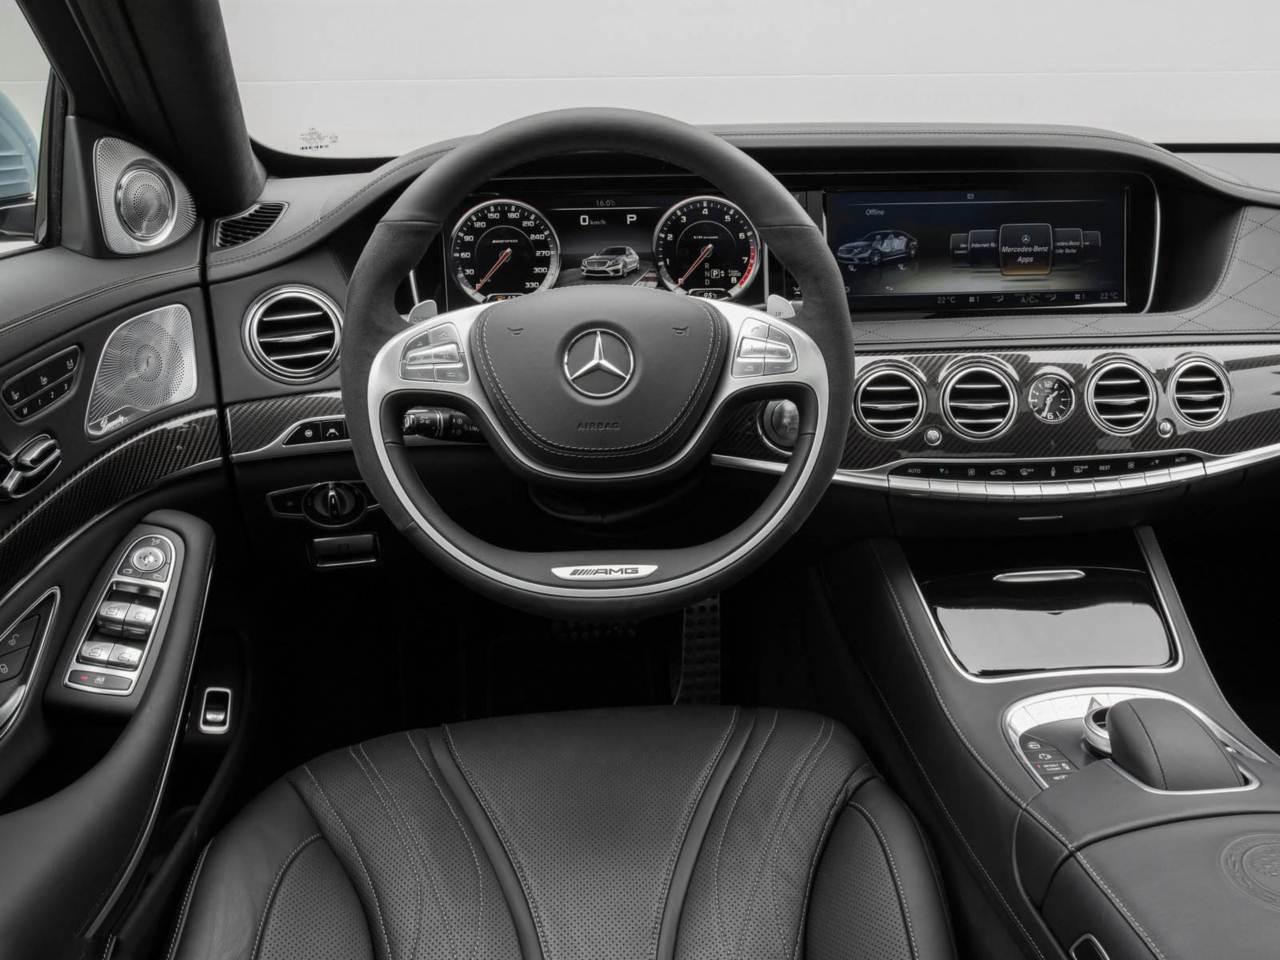 Mercedes benz s63 amg 2014 pre o parte de r 440 mil na for Mercedes g interno